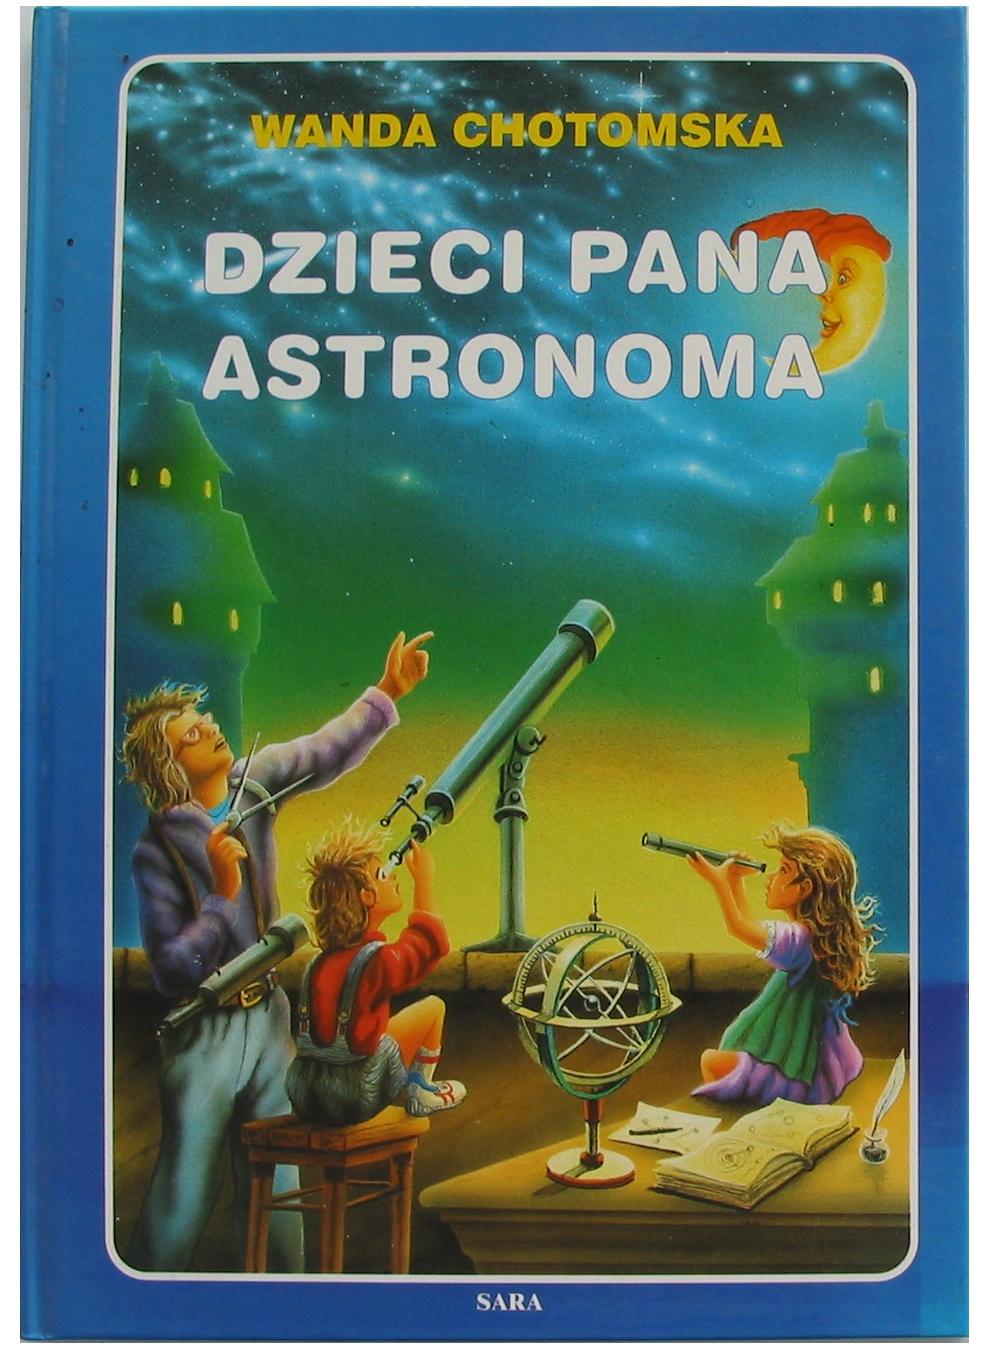 Dzieci Pana Astronoma Chotomska Oprawa Twarda 7070474986